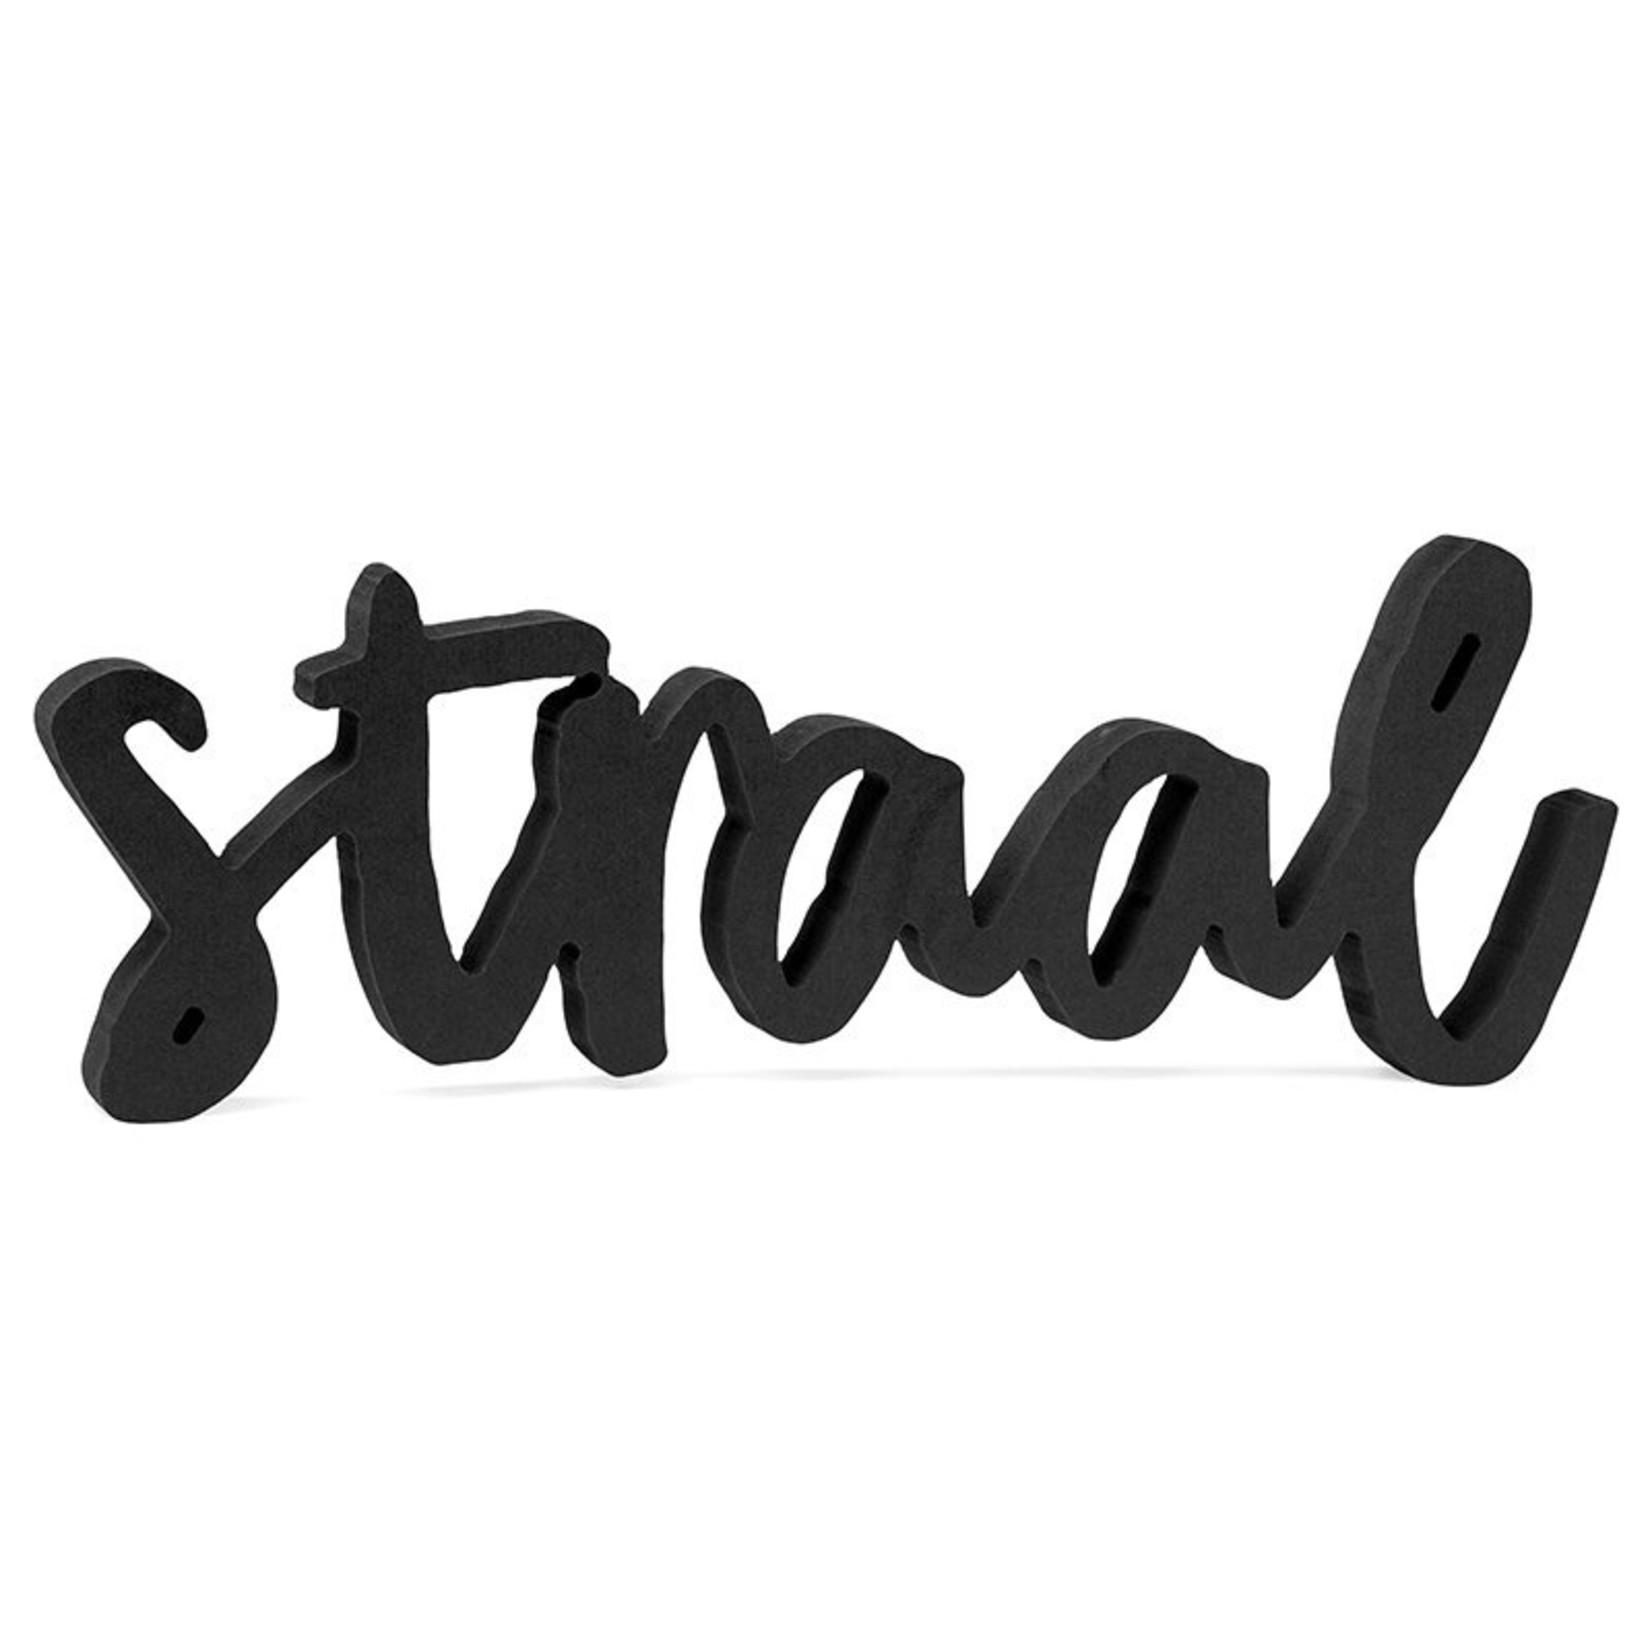 Letters zwart hout 'Straal' Zoedt